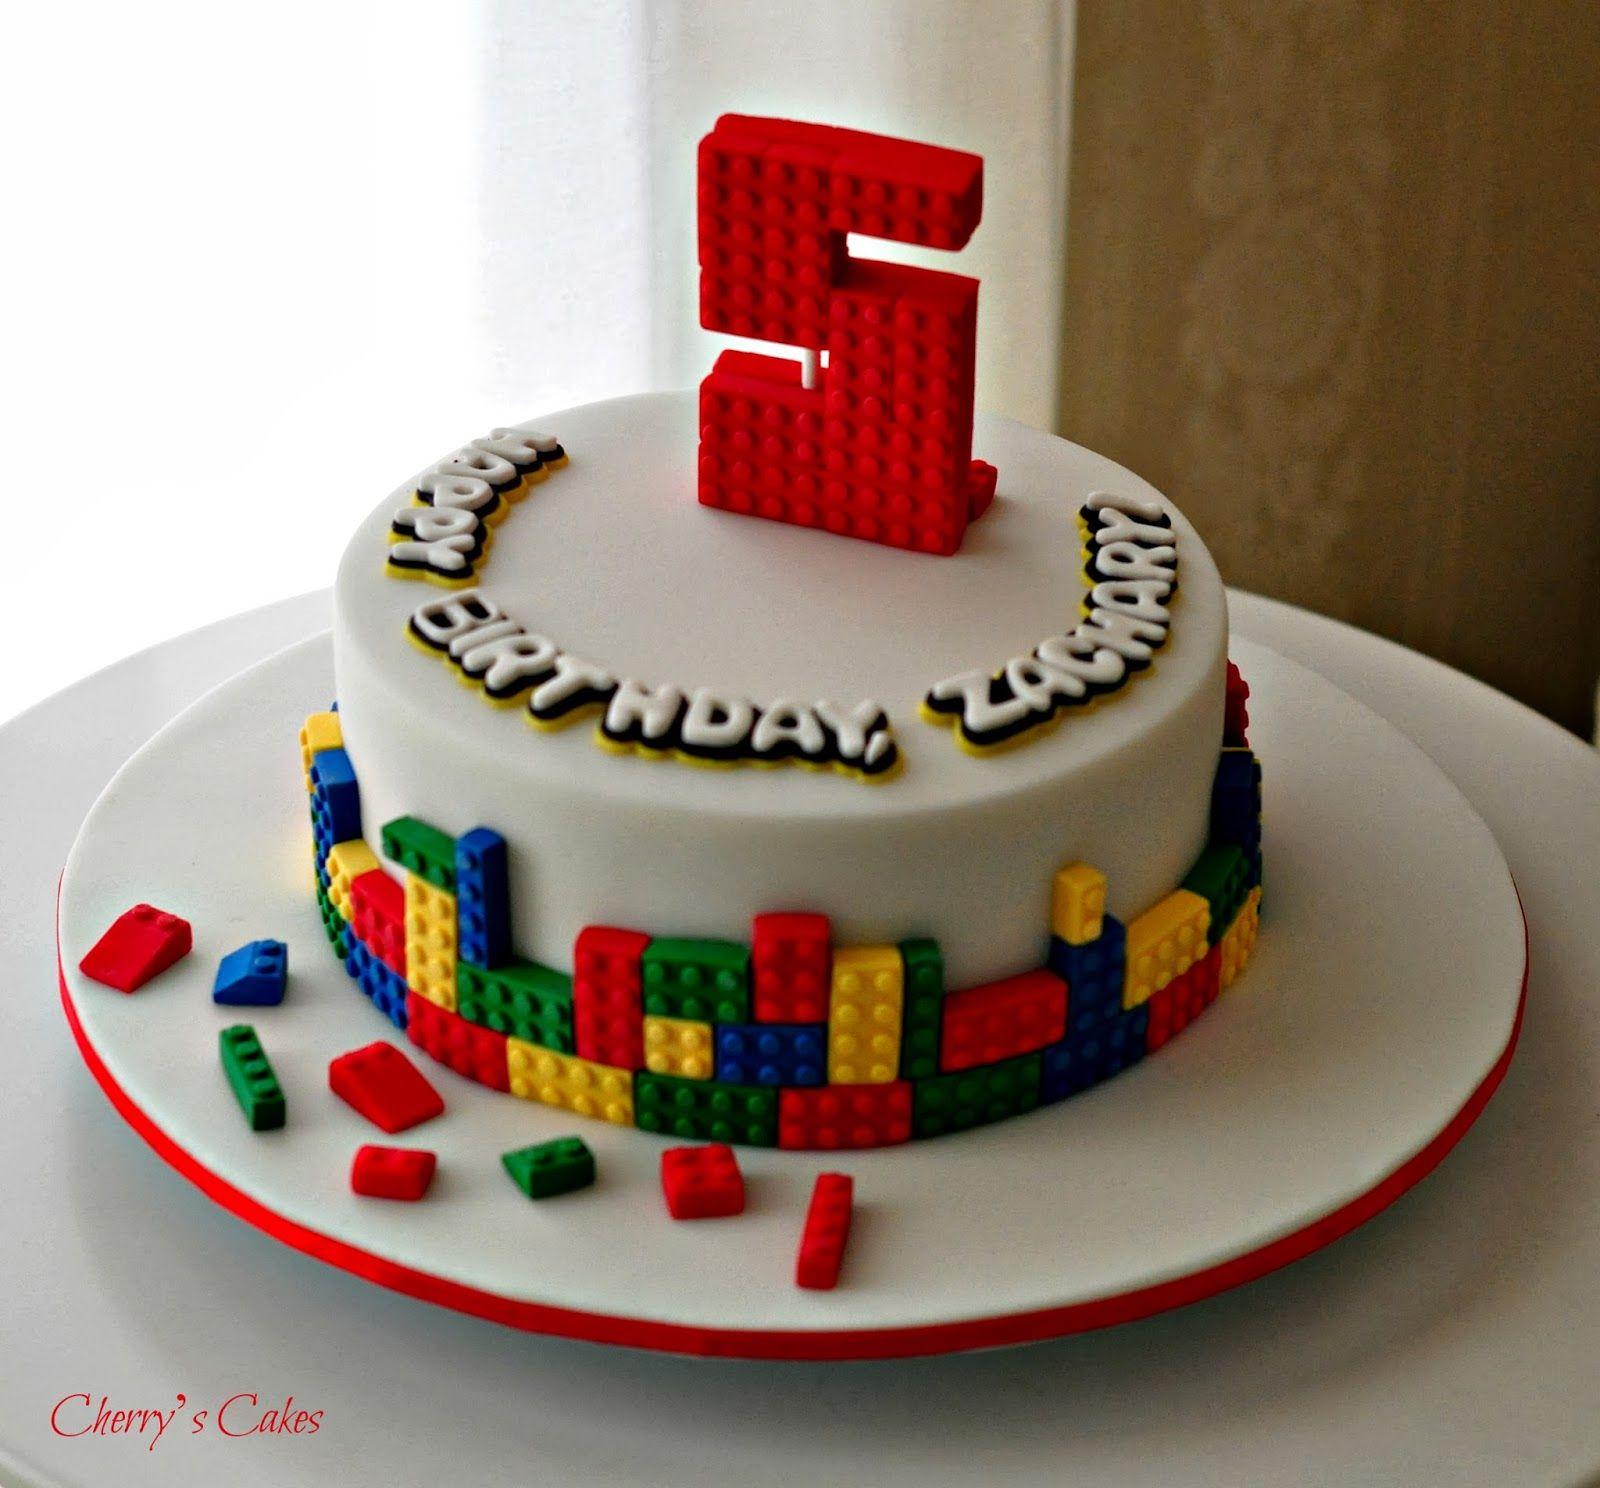 Sensational Building Blocks In 2020 Lego Birthday Cake Boy Birthday Cake Funny Birthday Cards Online Fluifree Goldxyz